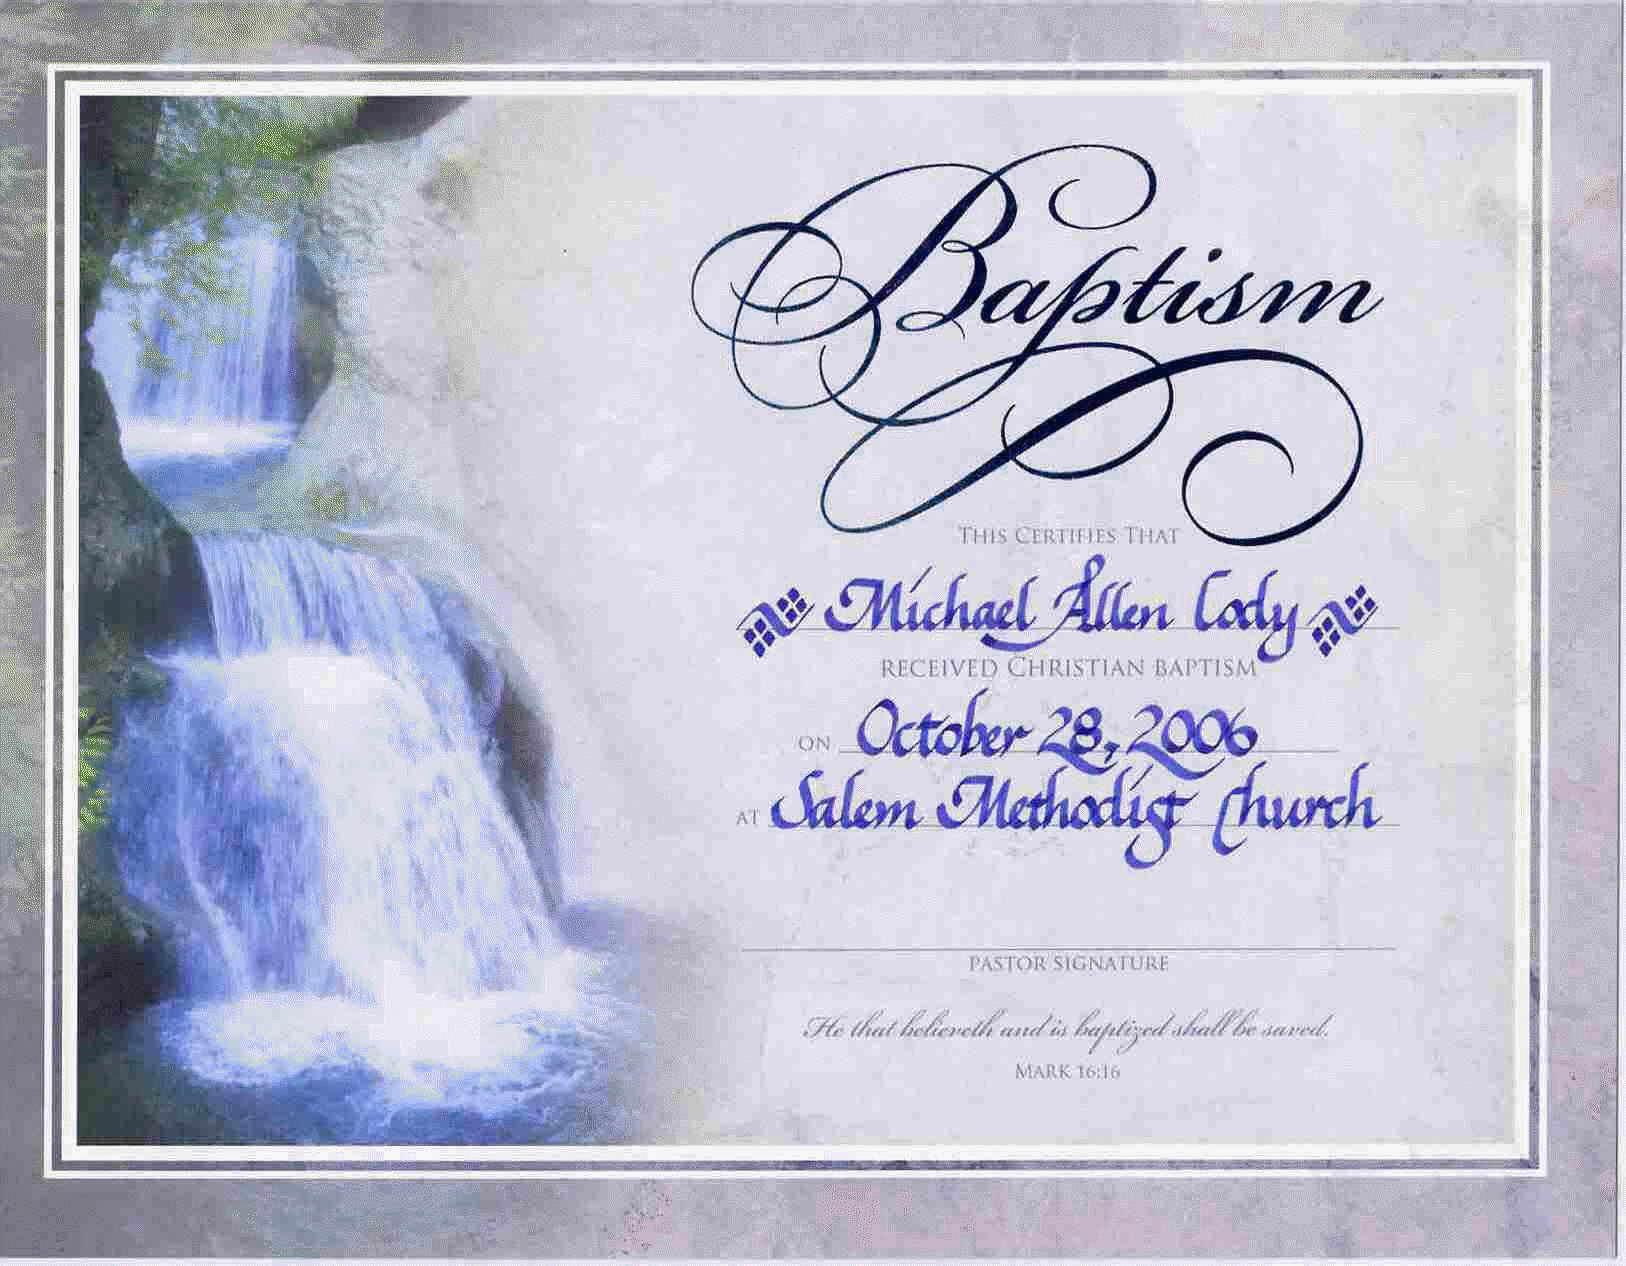 Christian Baptism Certificate Template